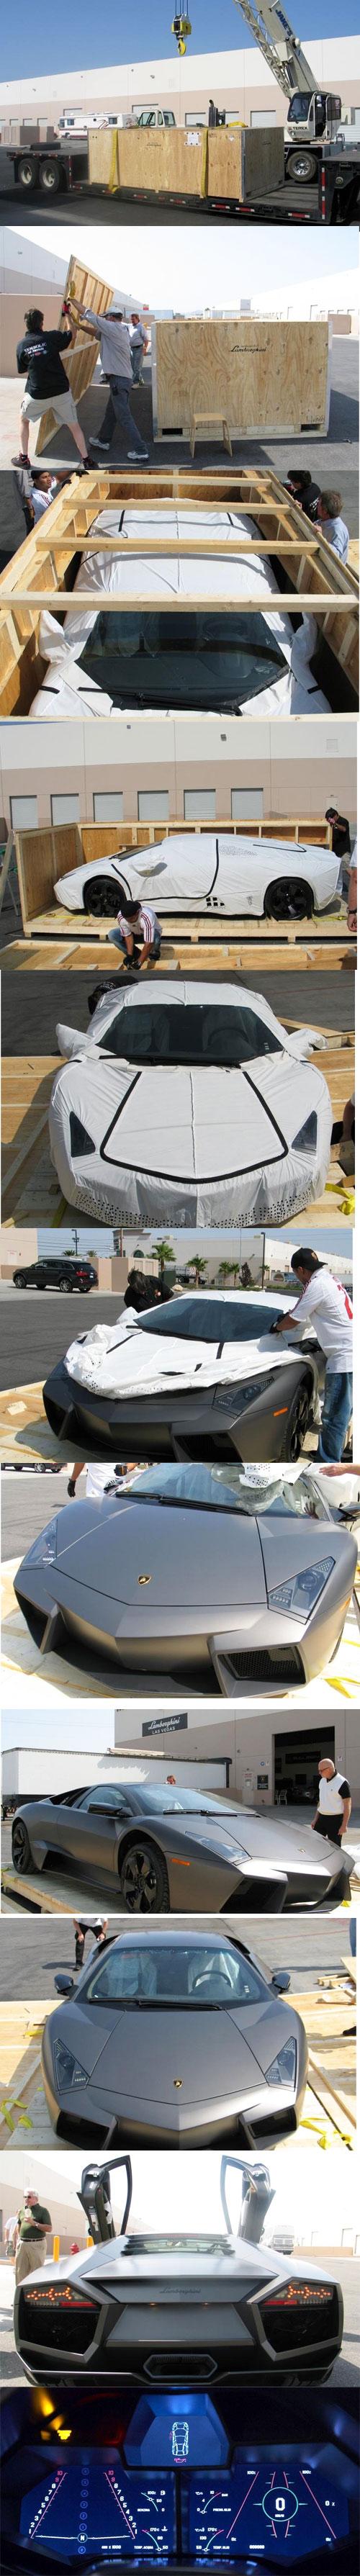 Unboxing a Lamborghini